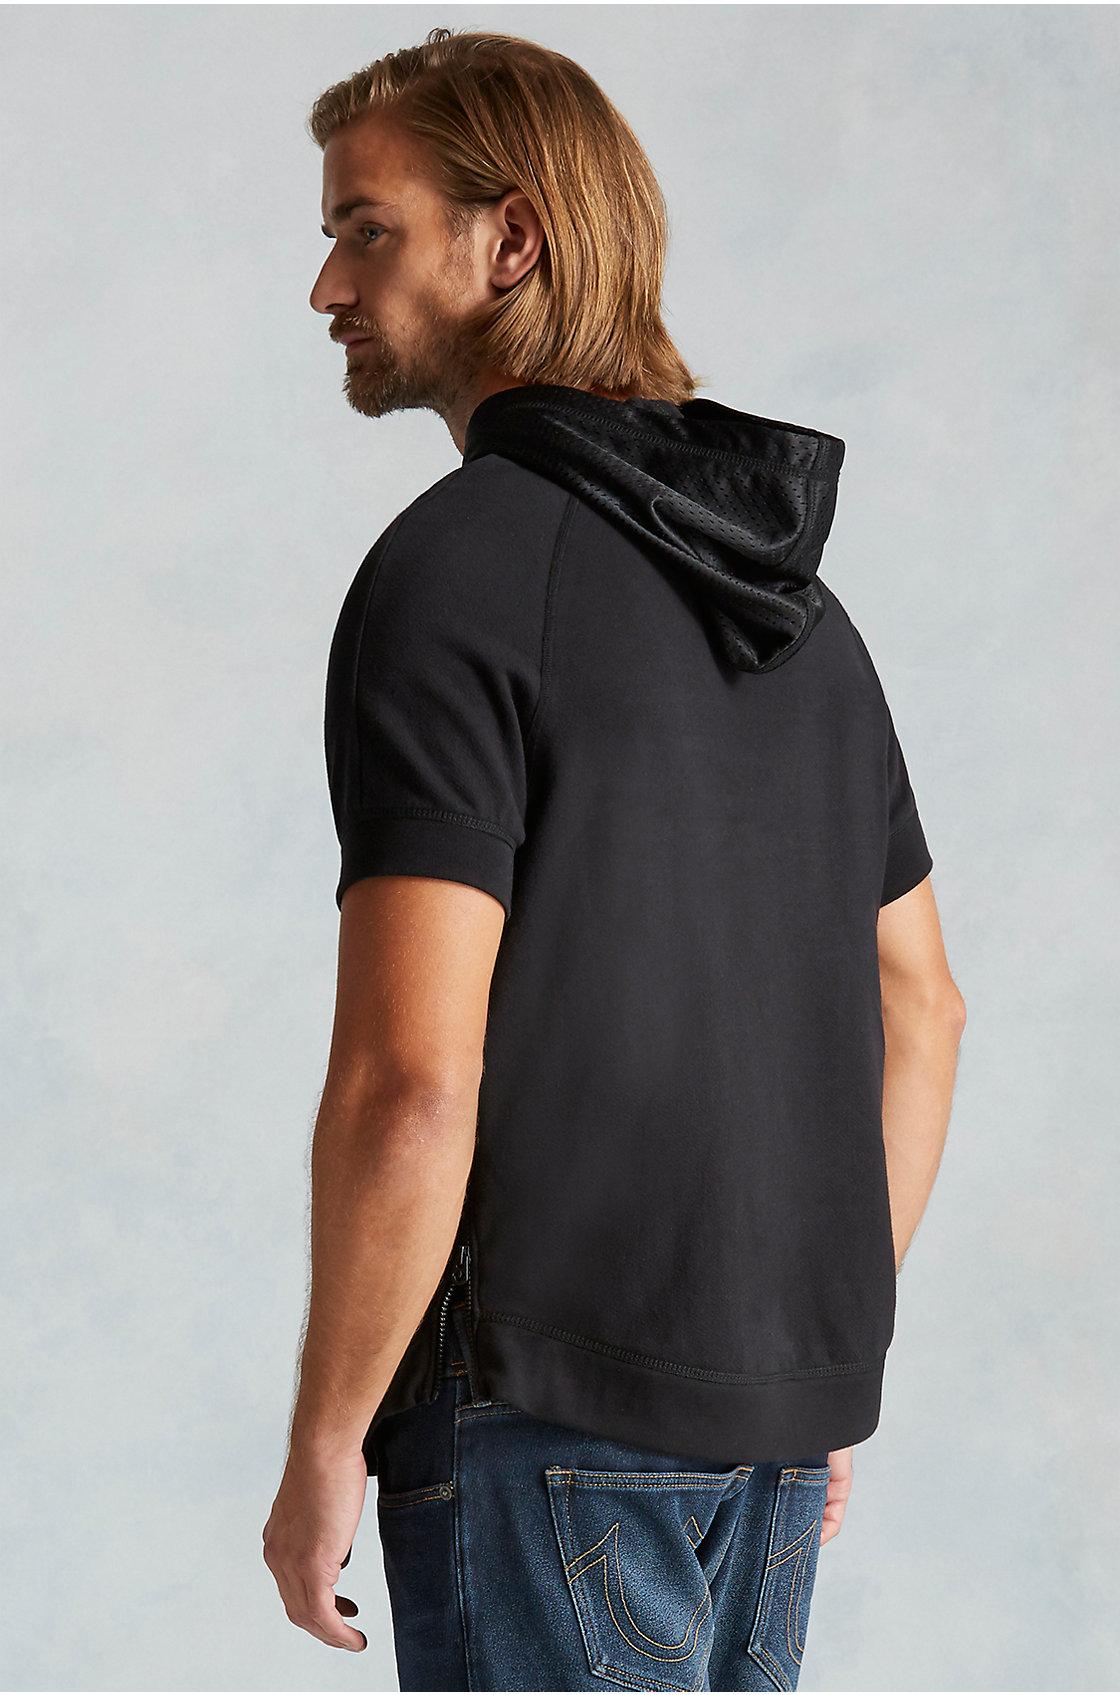 Short Sleeve Pullover Hoodie Men - Hardon Clothes